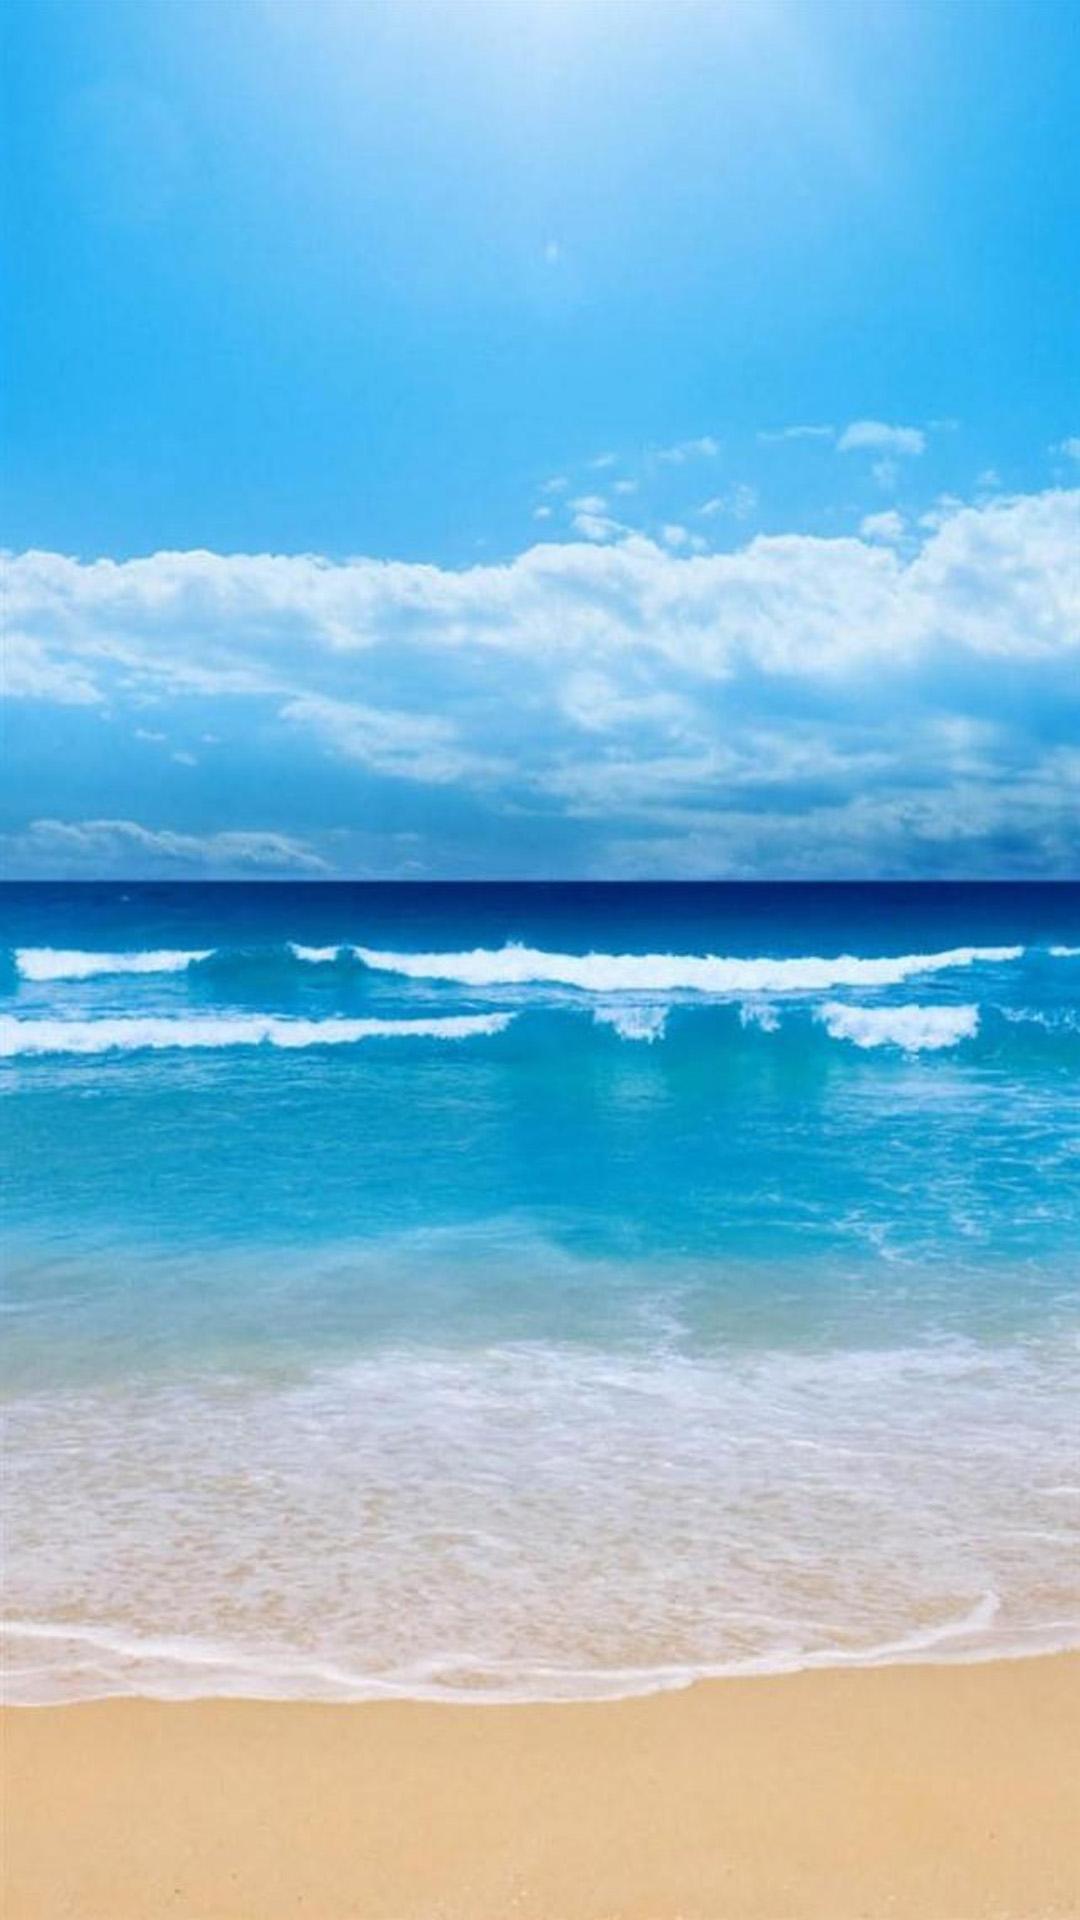 White Beaches And Blue Sky